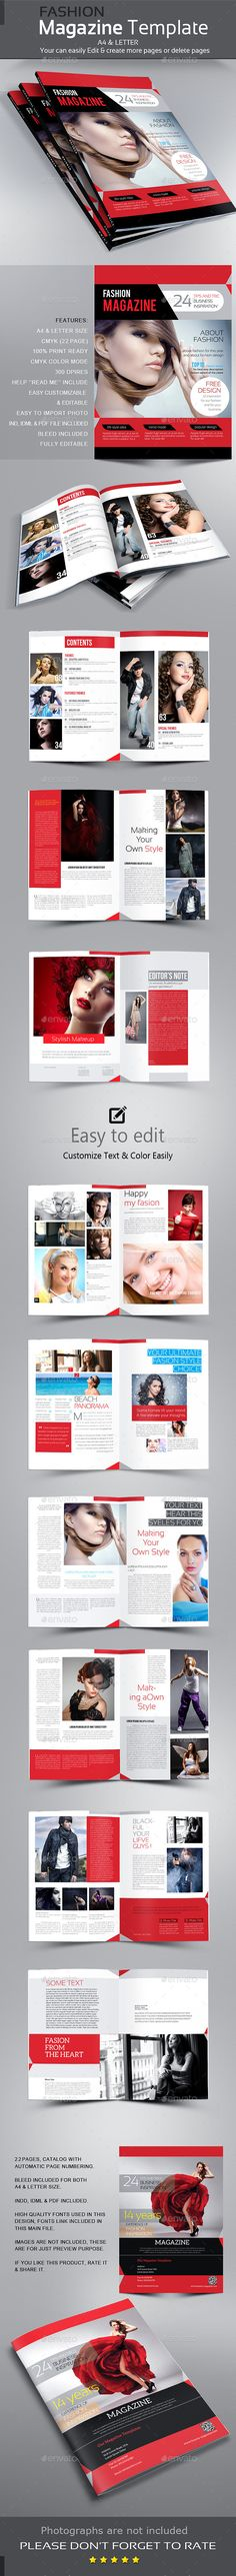 Fashion Catalog Fashion, Brochures and Http www - fashion design brochure template